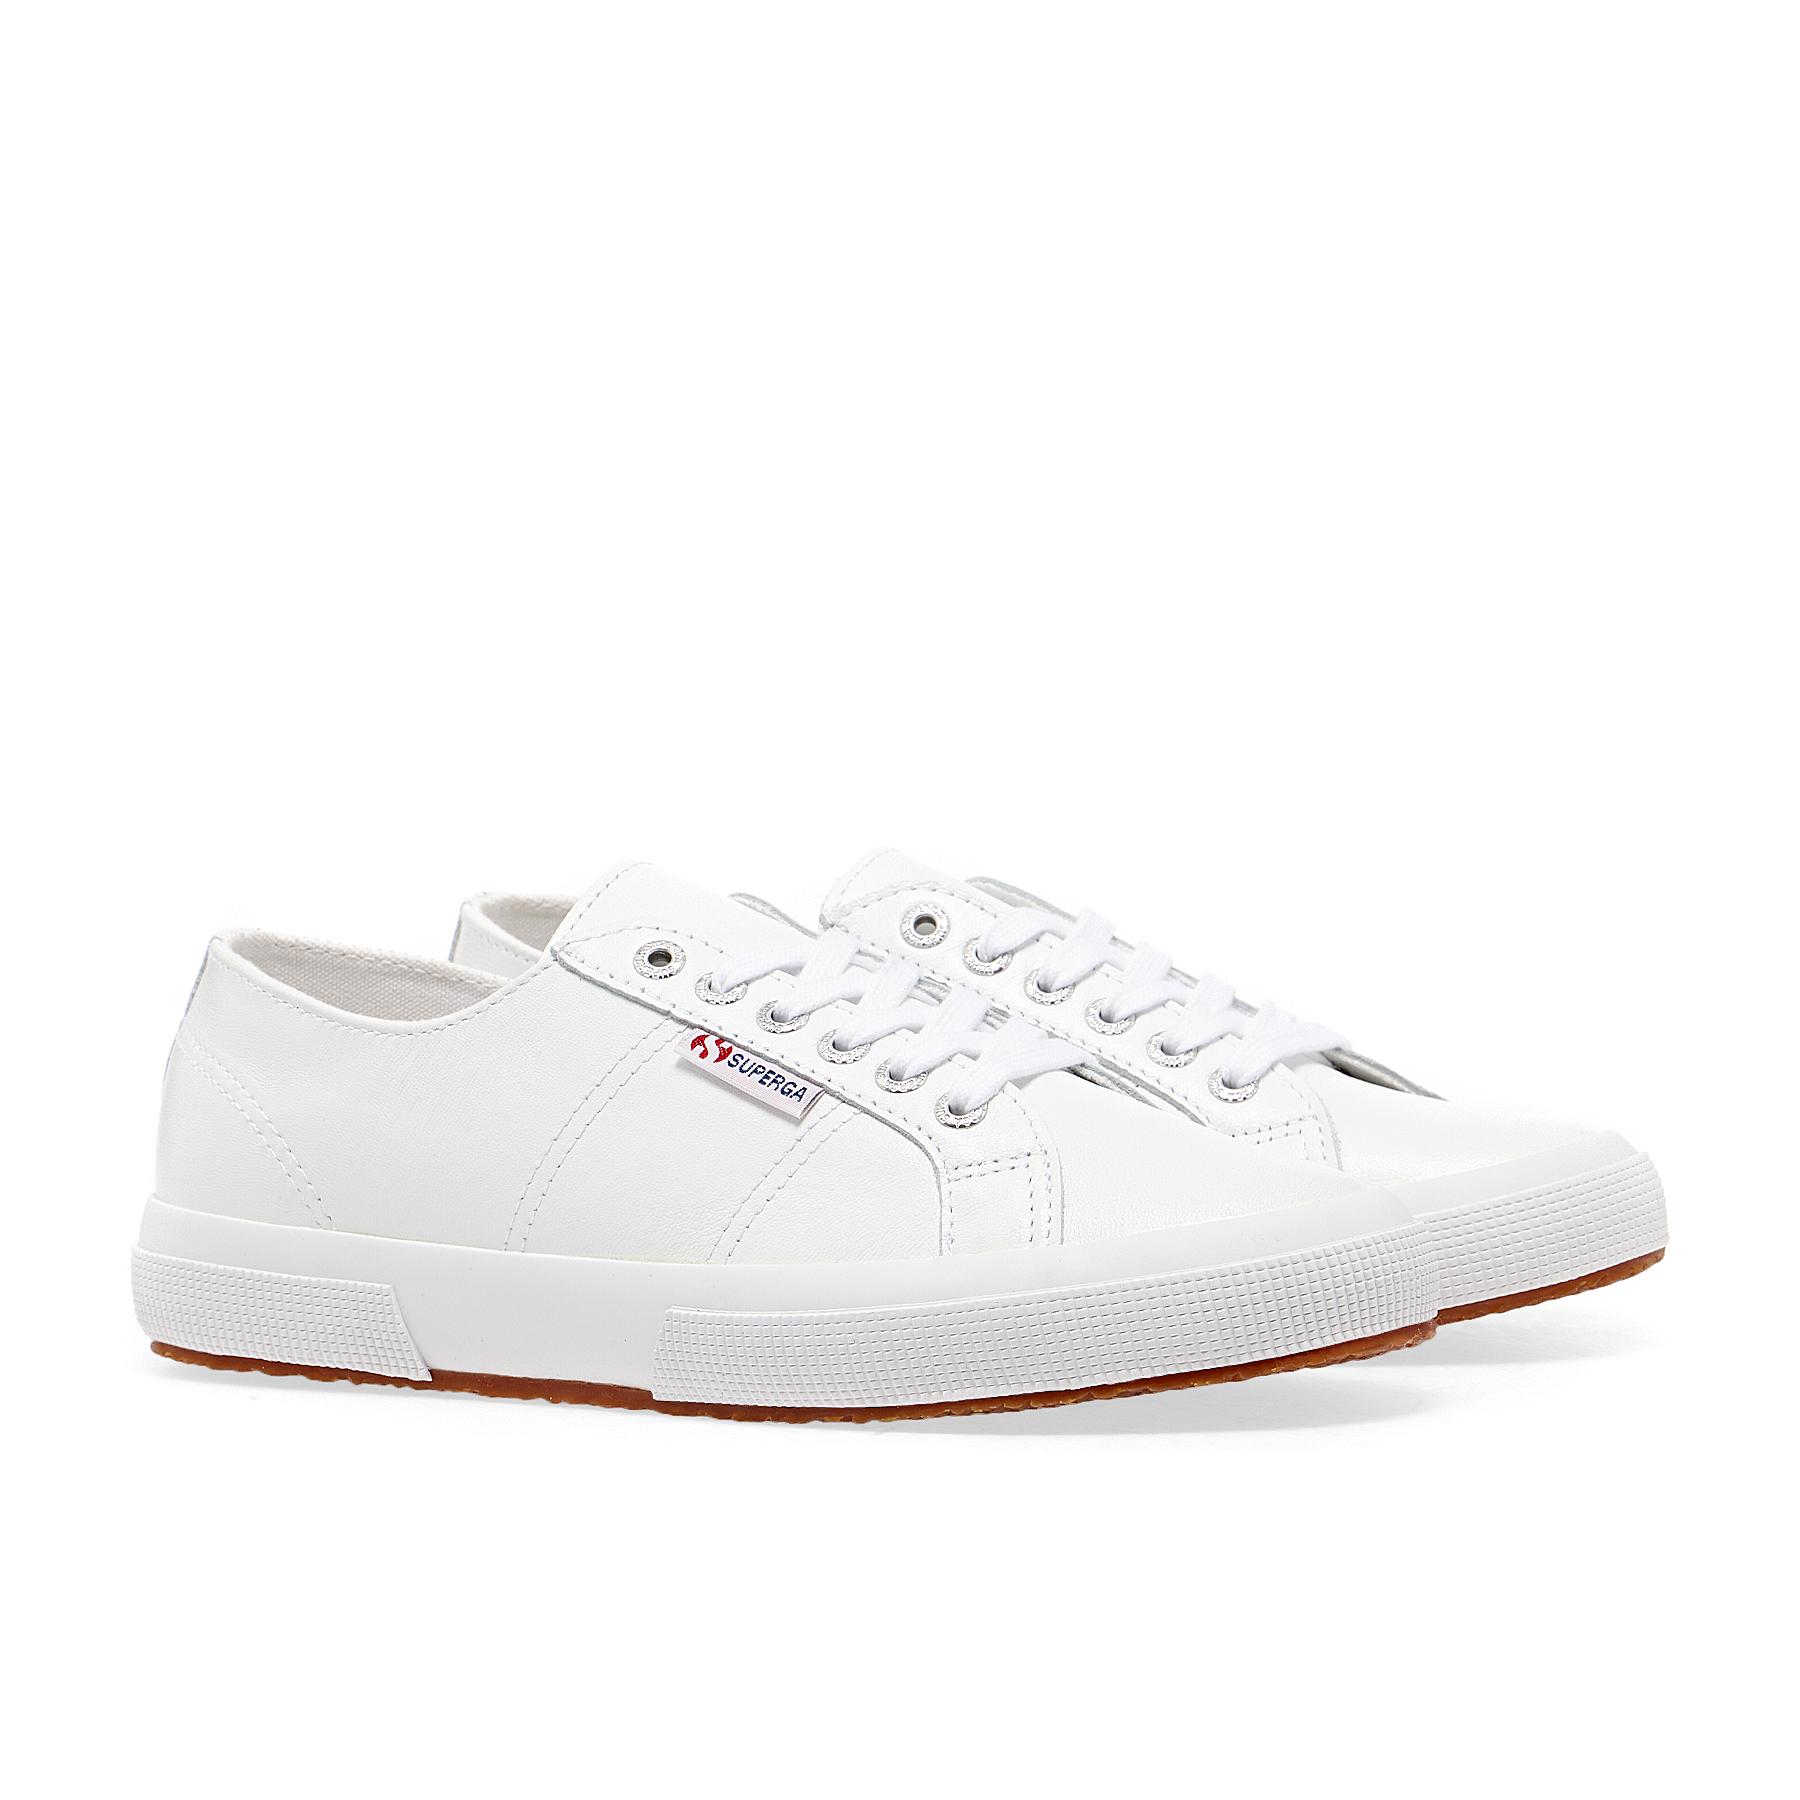 Superga 2750 Nappa Lea Shoes - White